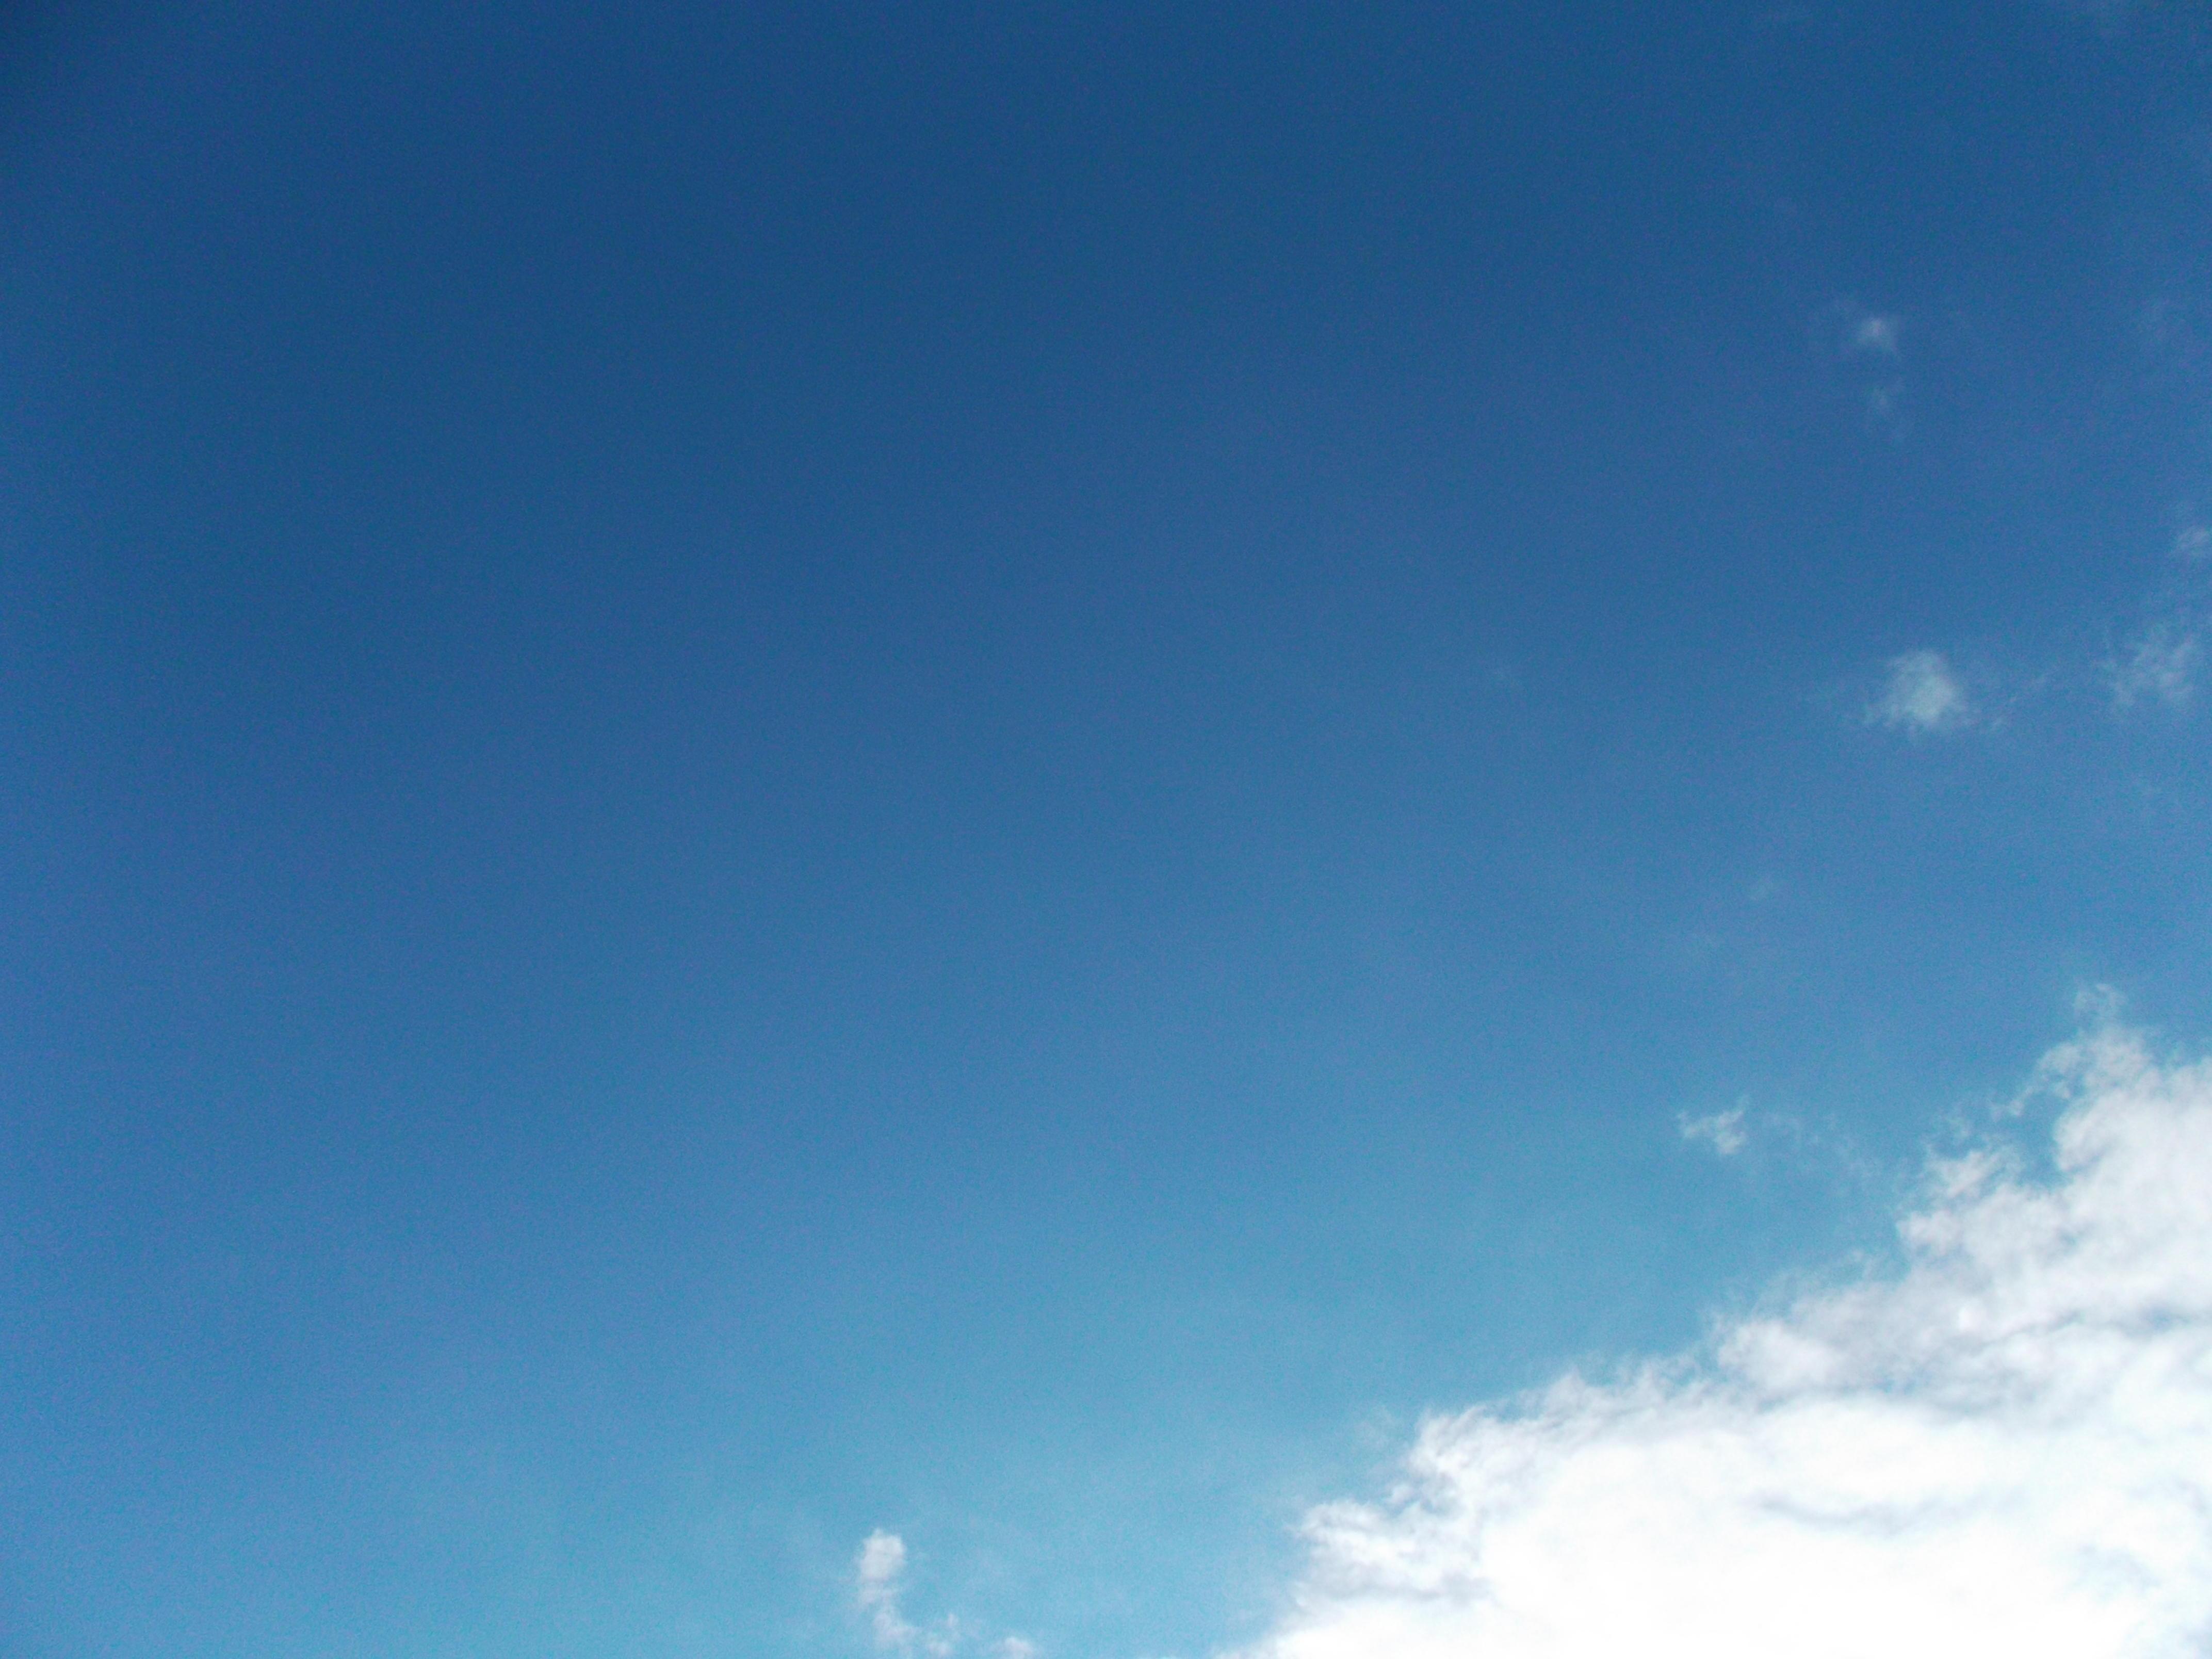 2013-04-27 Longitude -0.371 Latitude 49.182 Altitude 29 Heure 18h06